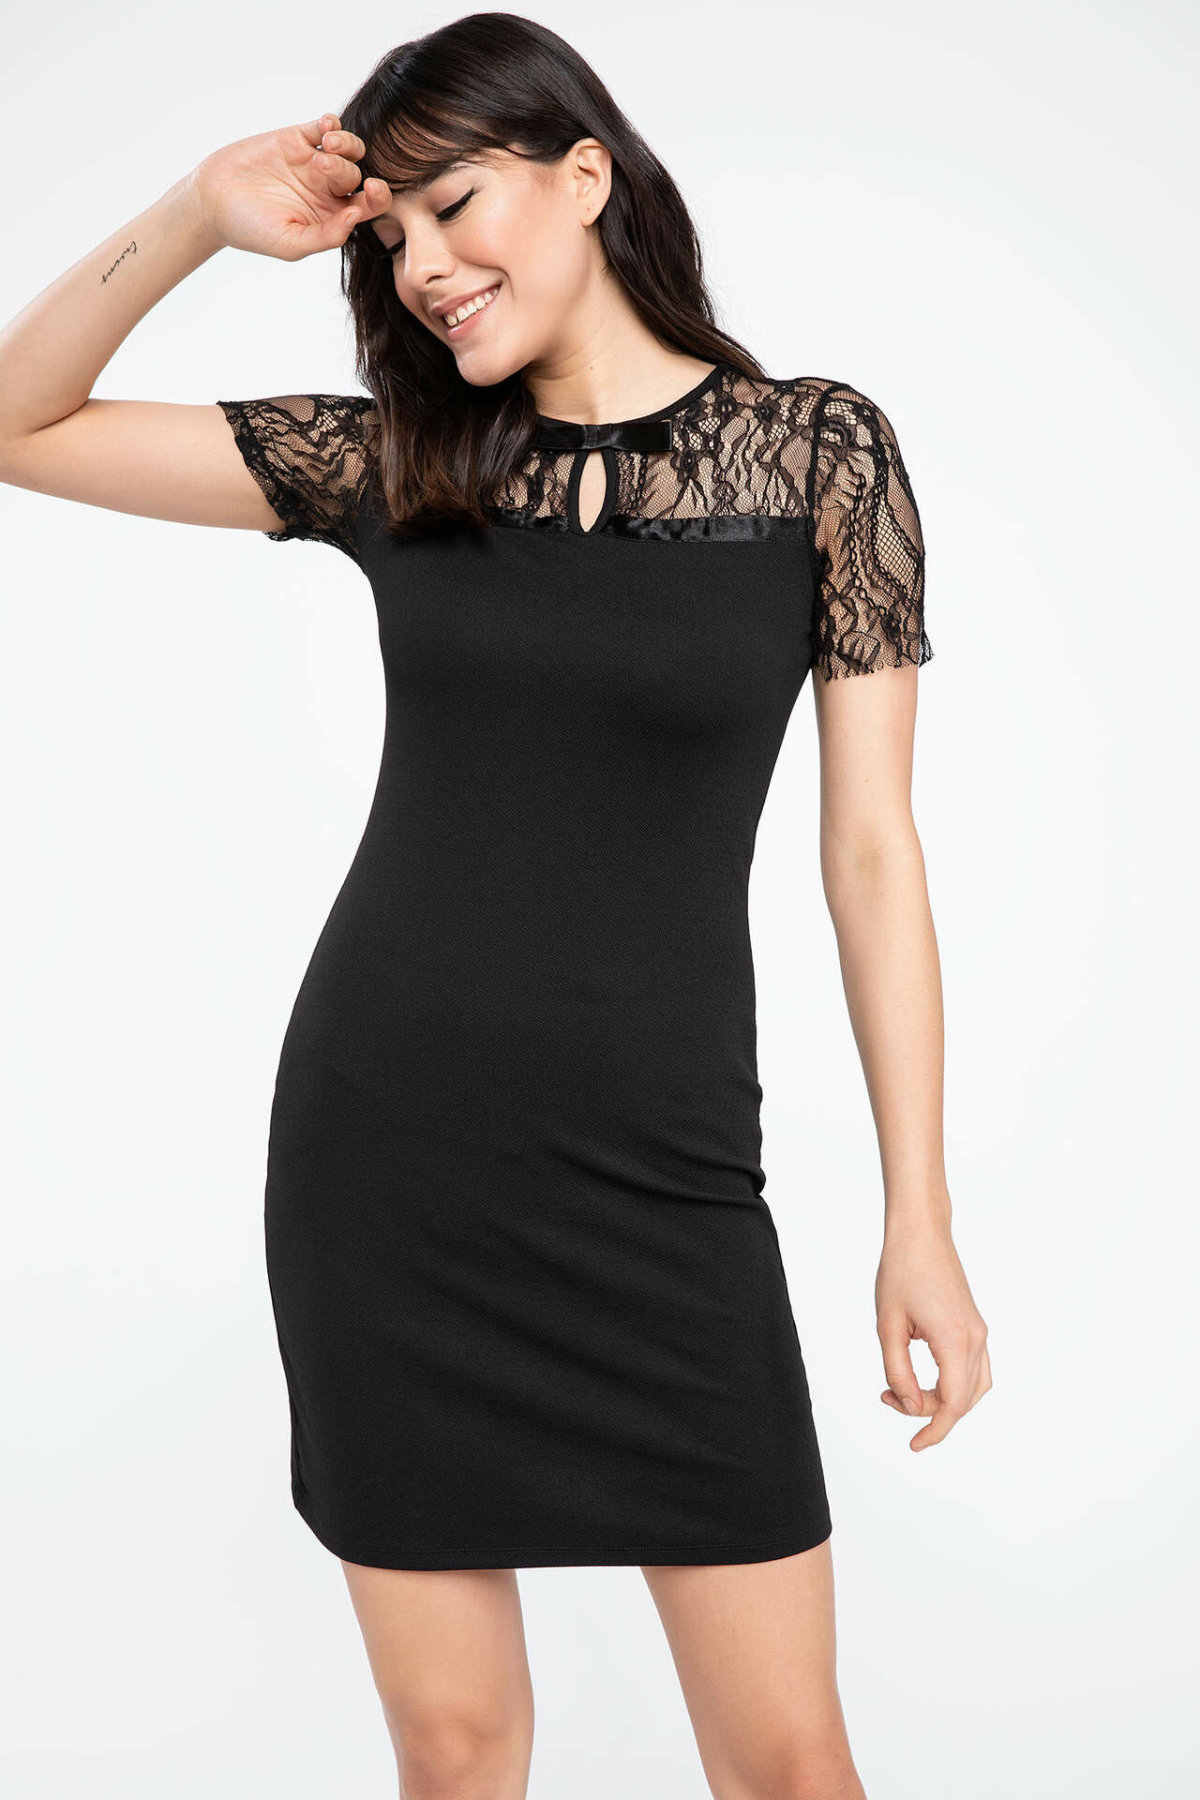 DeFacto Mode Frau Gestrickte Spitze Kurze Kleid Damen Casual